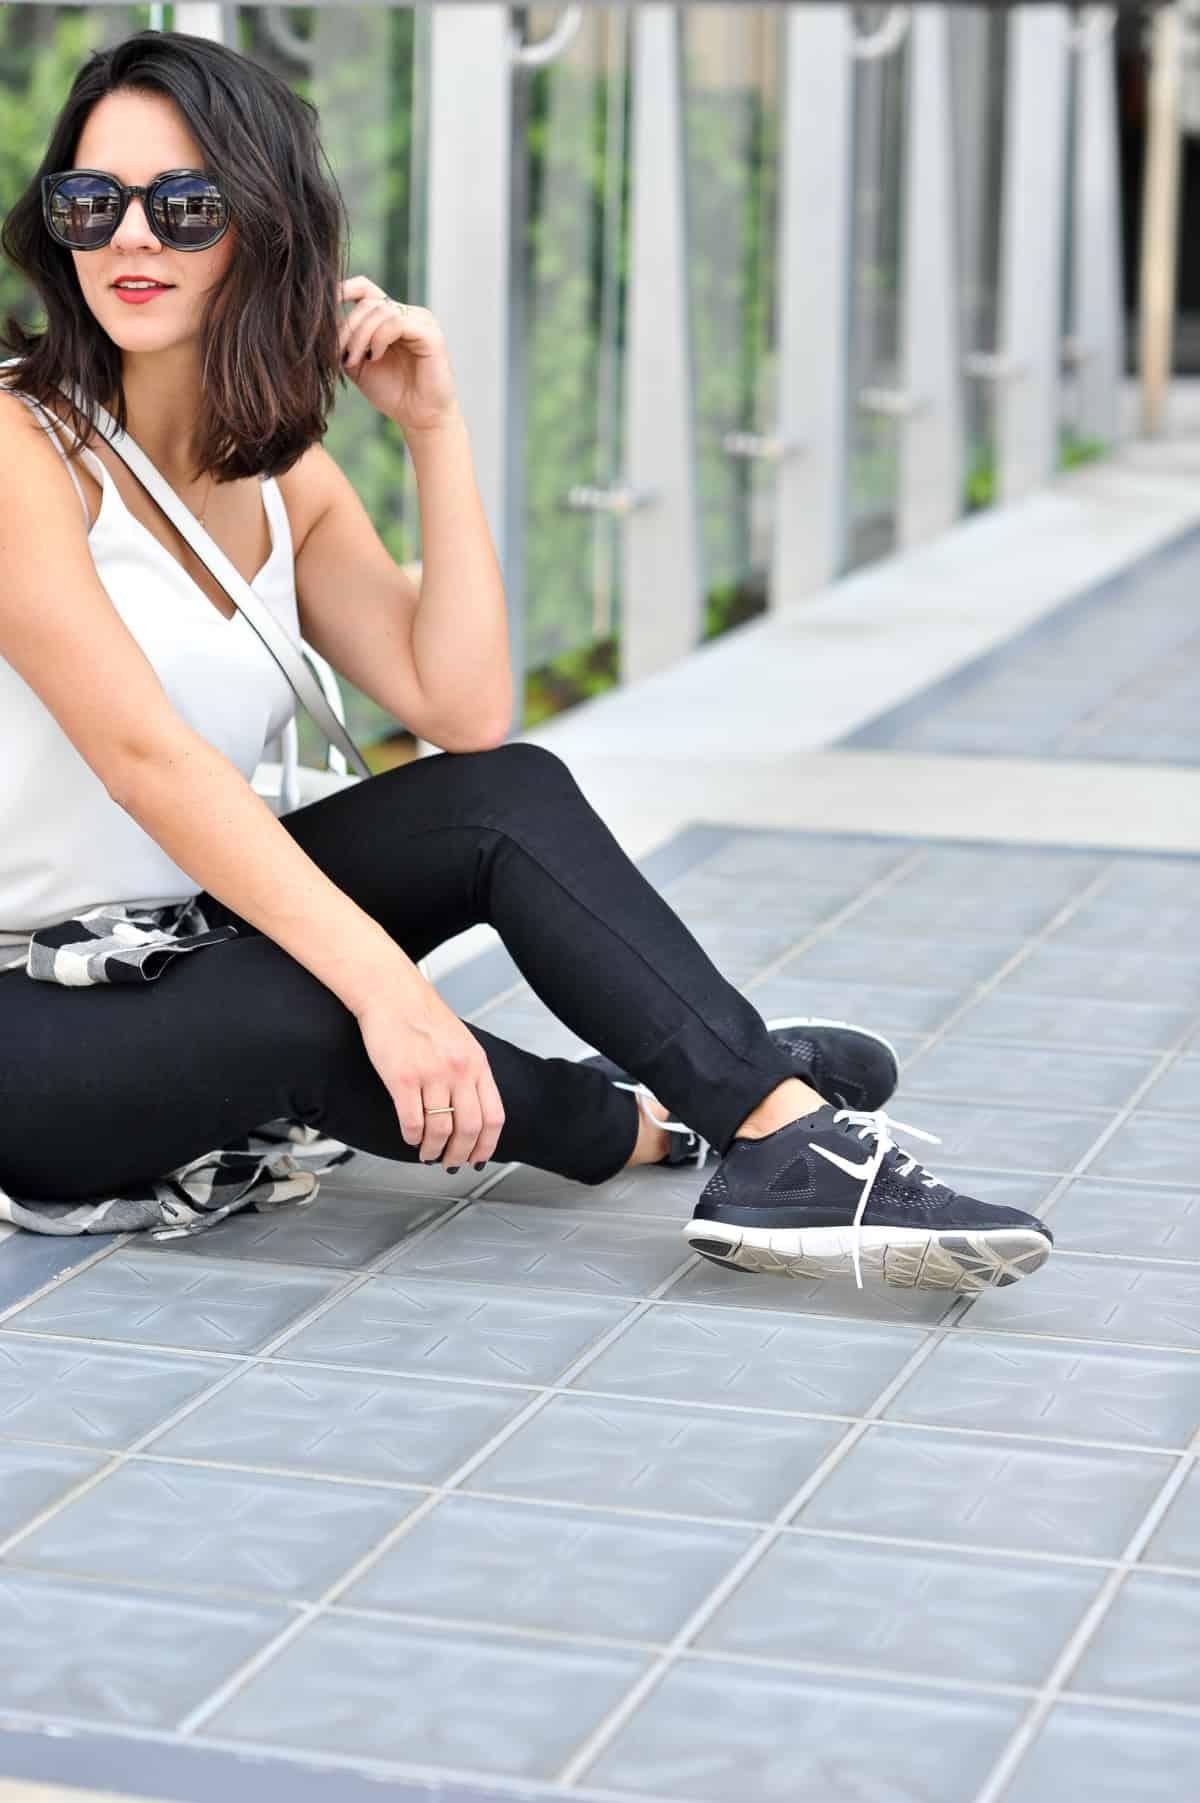 Black and white, black nikes, how to style sneakers via @mystylevita - 22